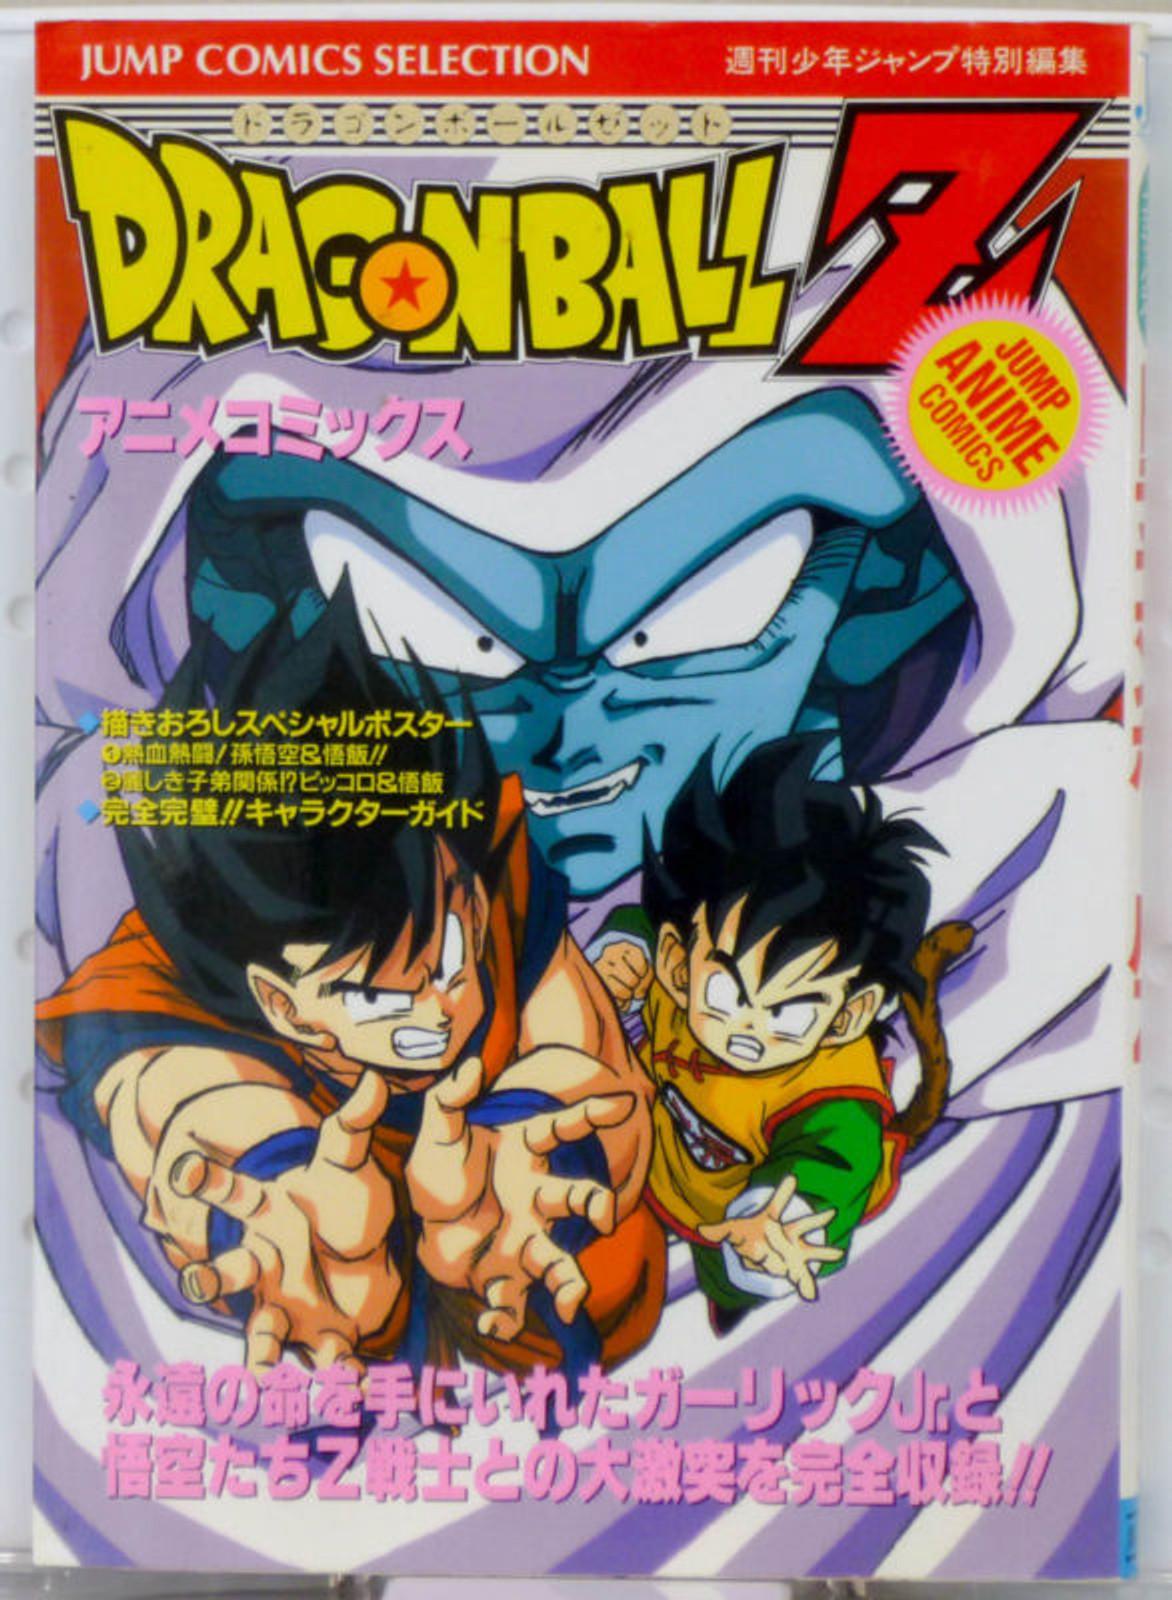 Dragon Ball Z Anime Movie Film Comics Book JAPAN ANIME MANGA 8